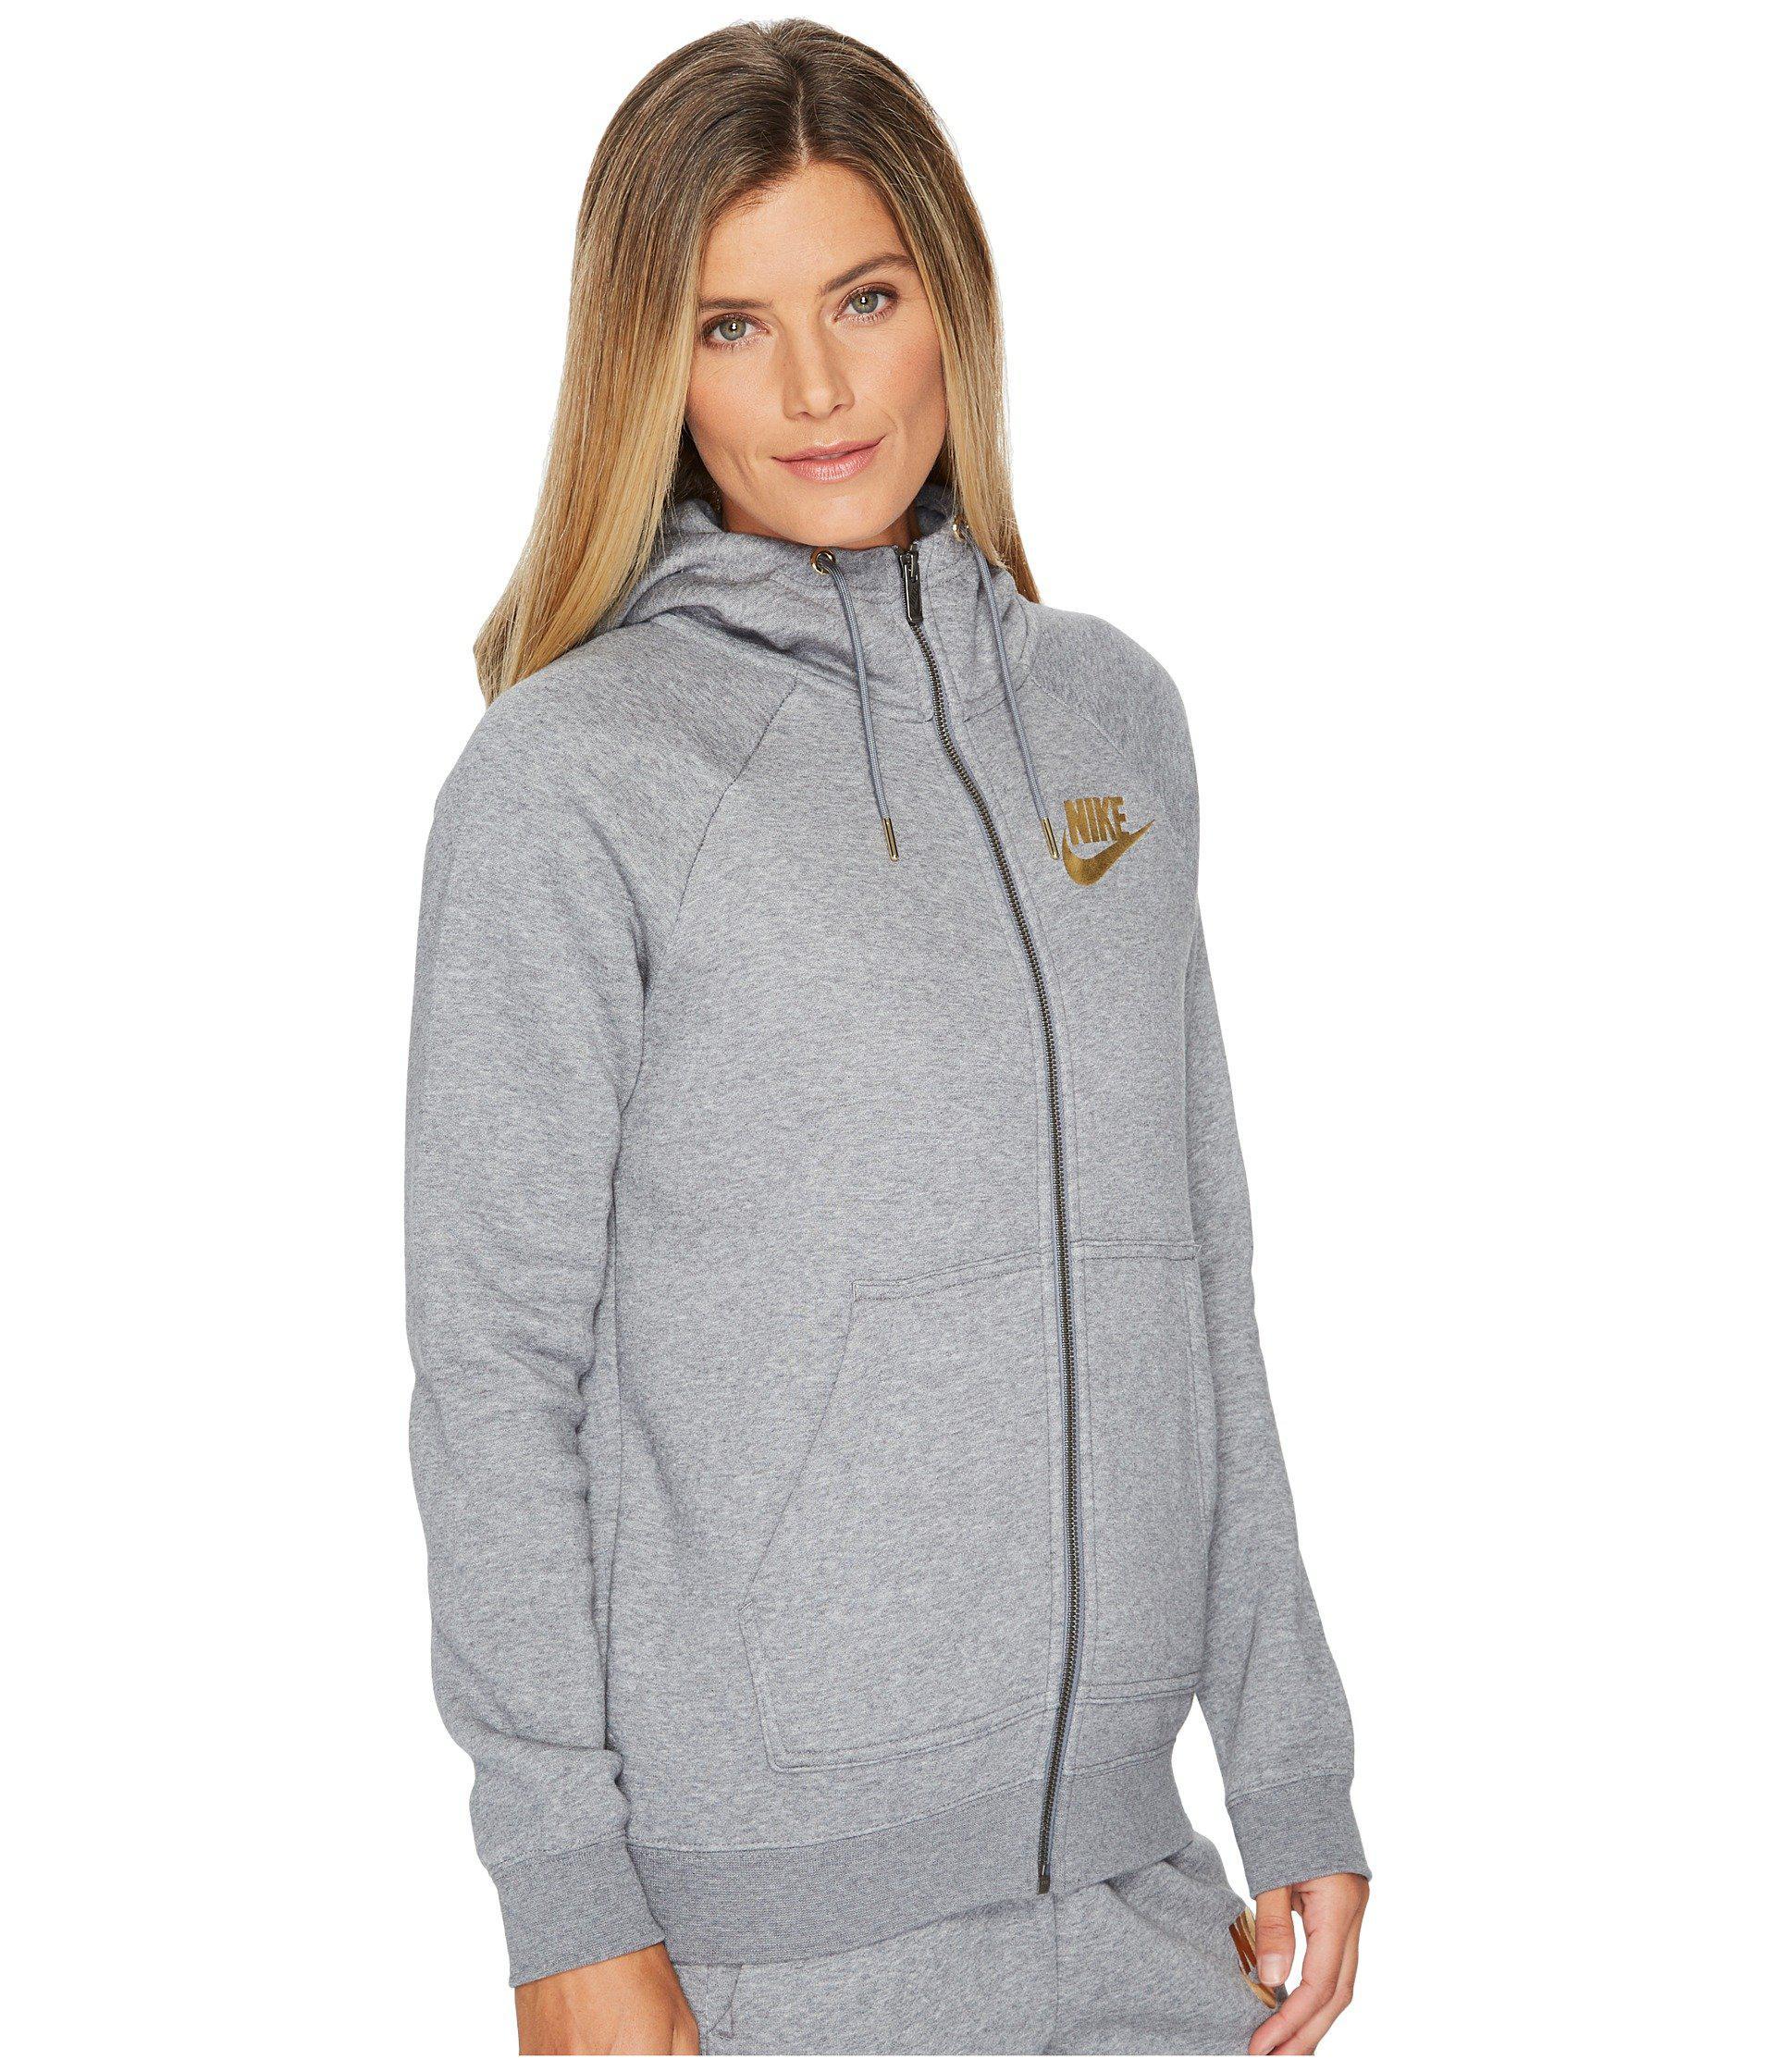 71b6b8634b3e Lyst - Nike Sportswear Rally Metallic Full-zip Hoodie in Gray